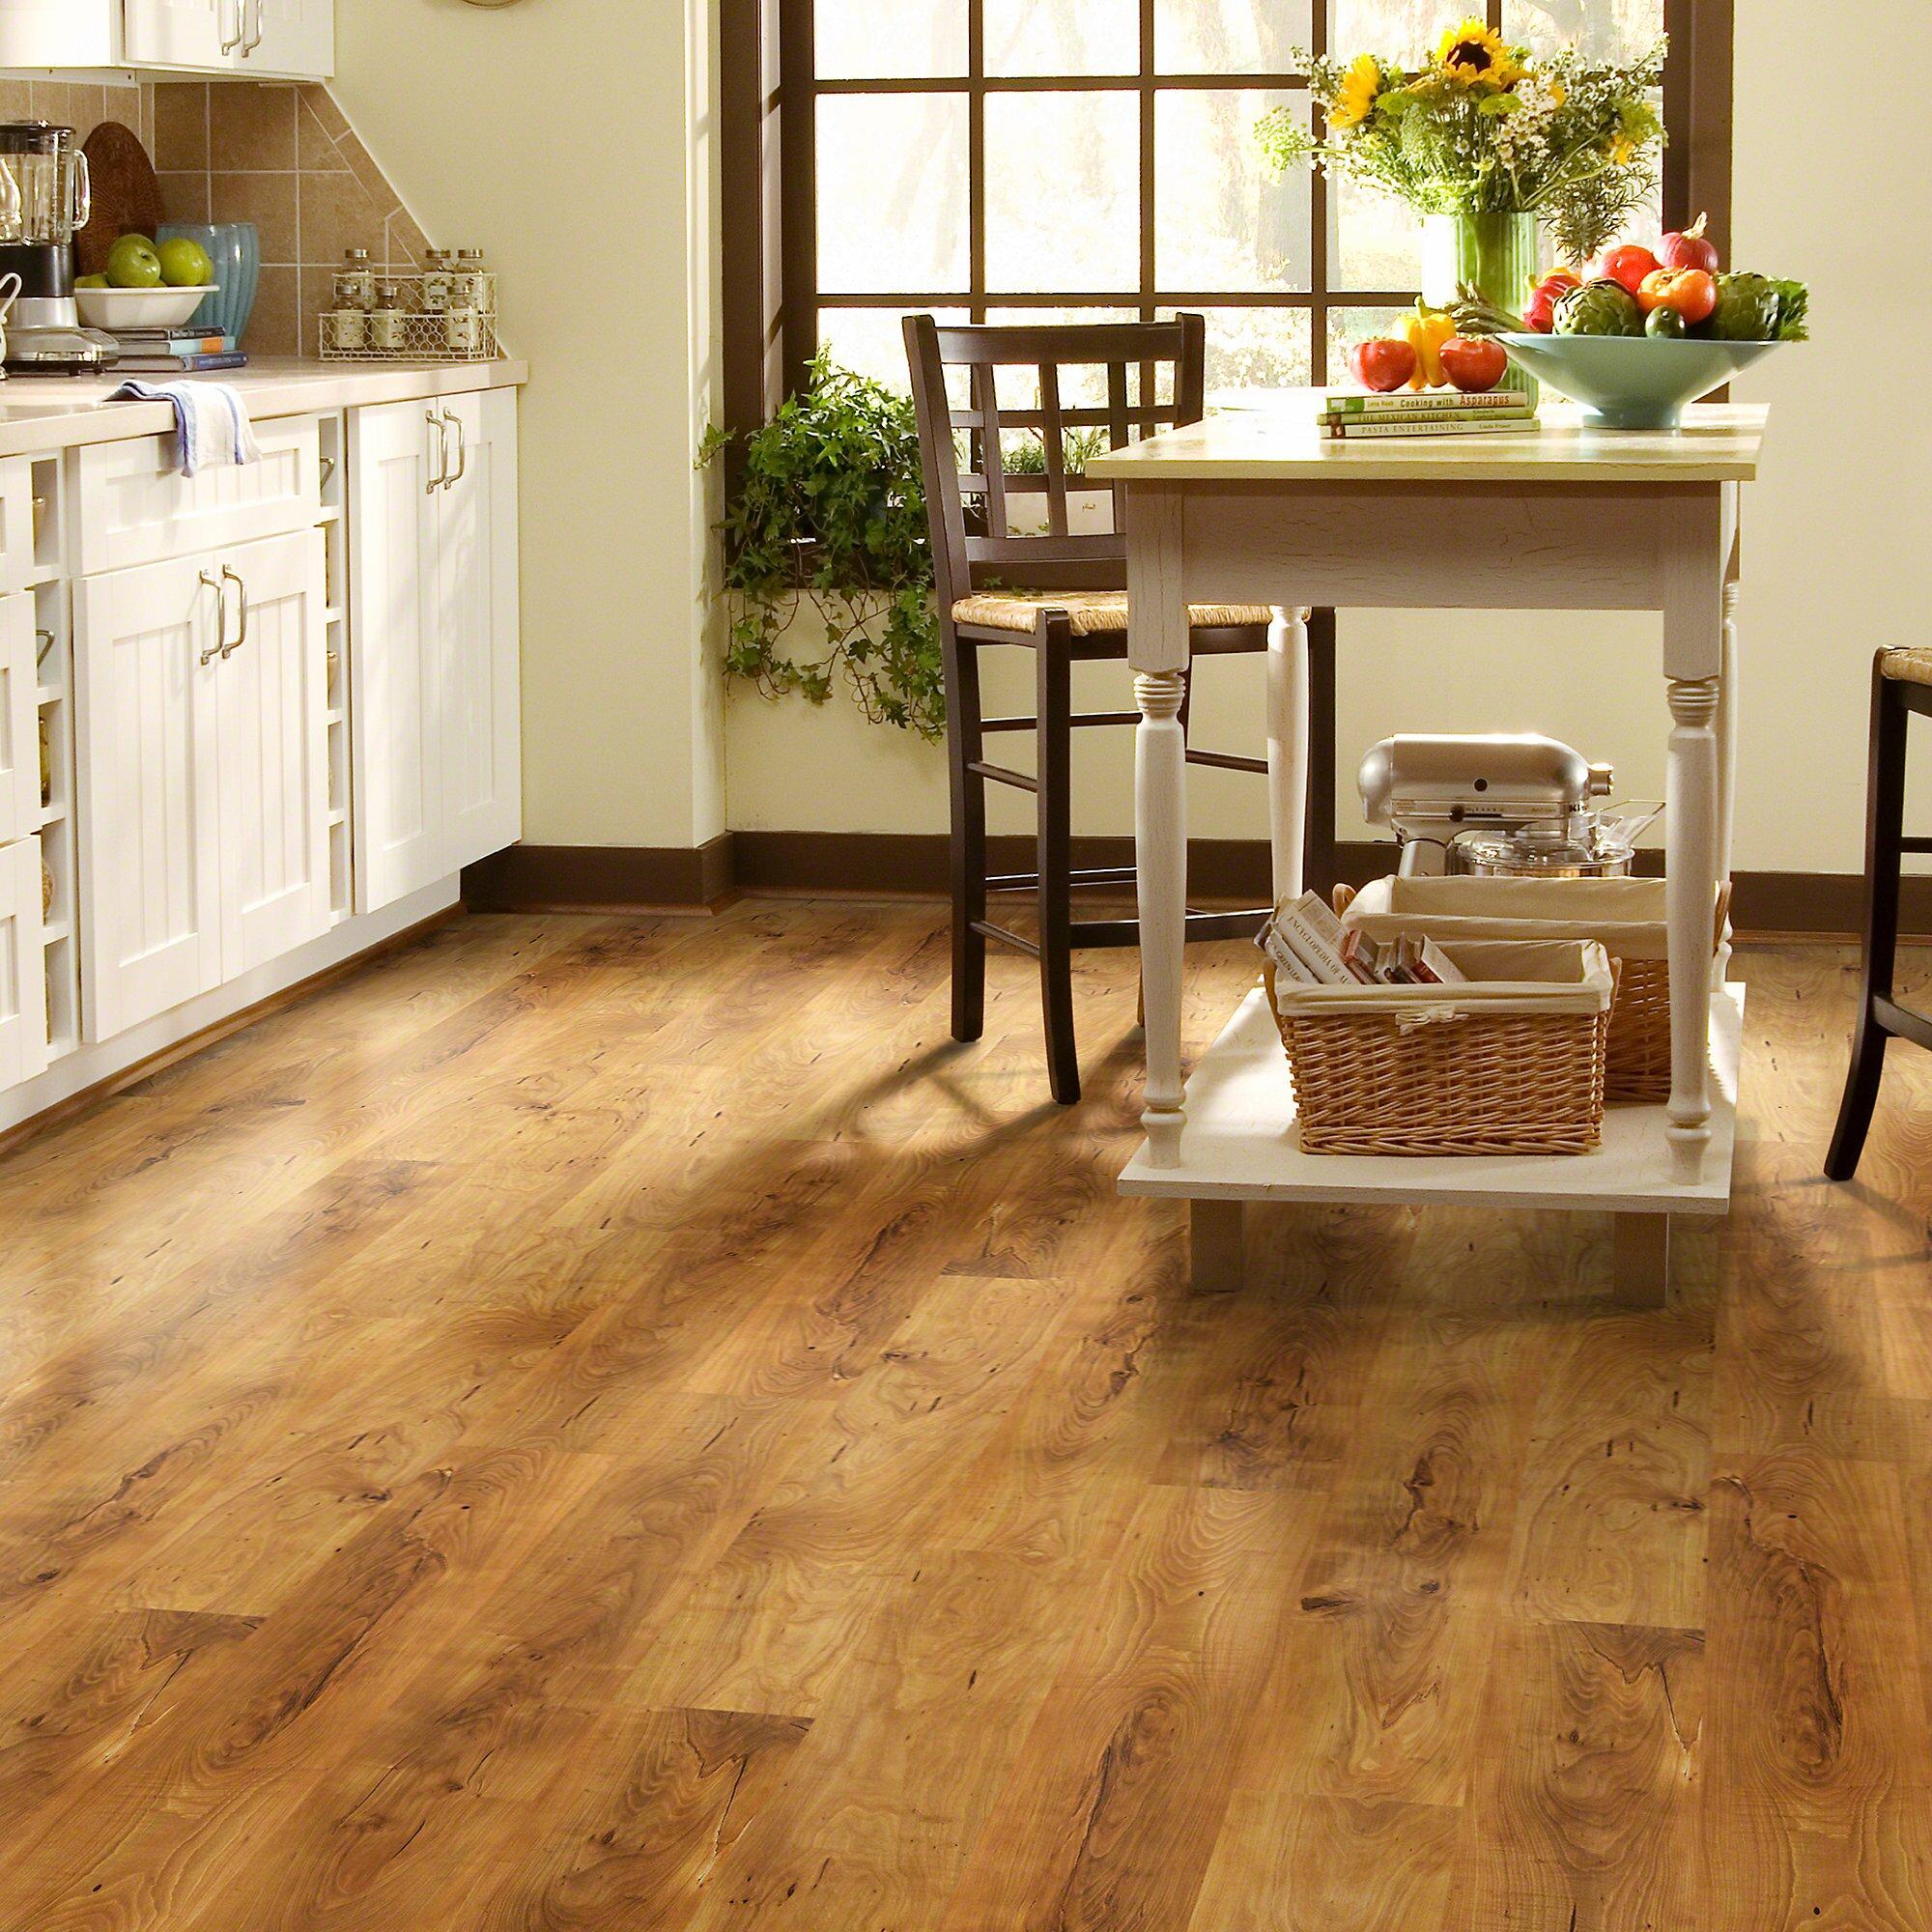 Pine Laminate Flooring install laminate flooring Fairfax 8 X 48 X 65mm Pine Laminate